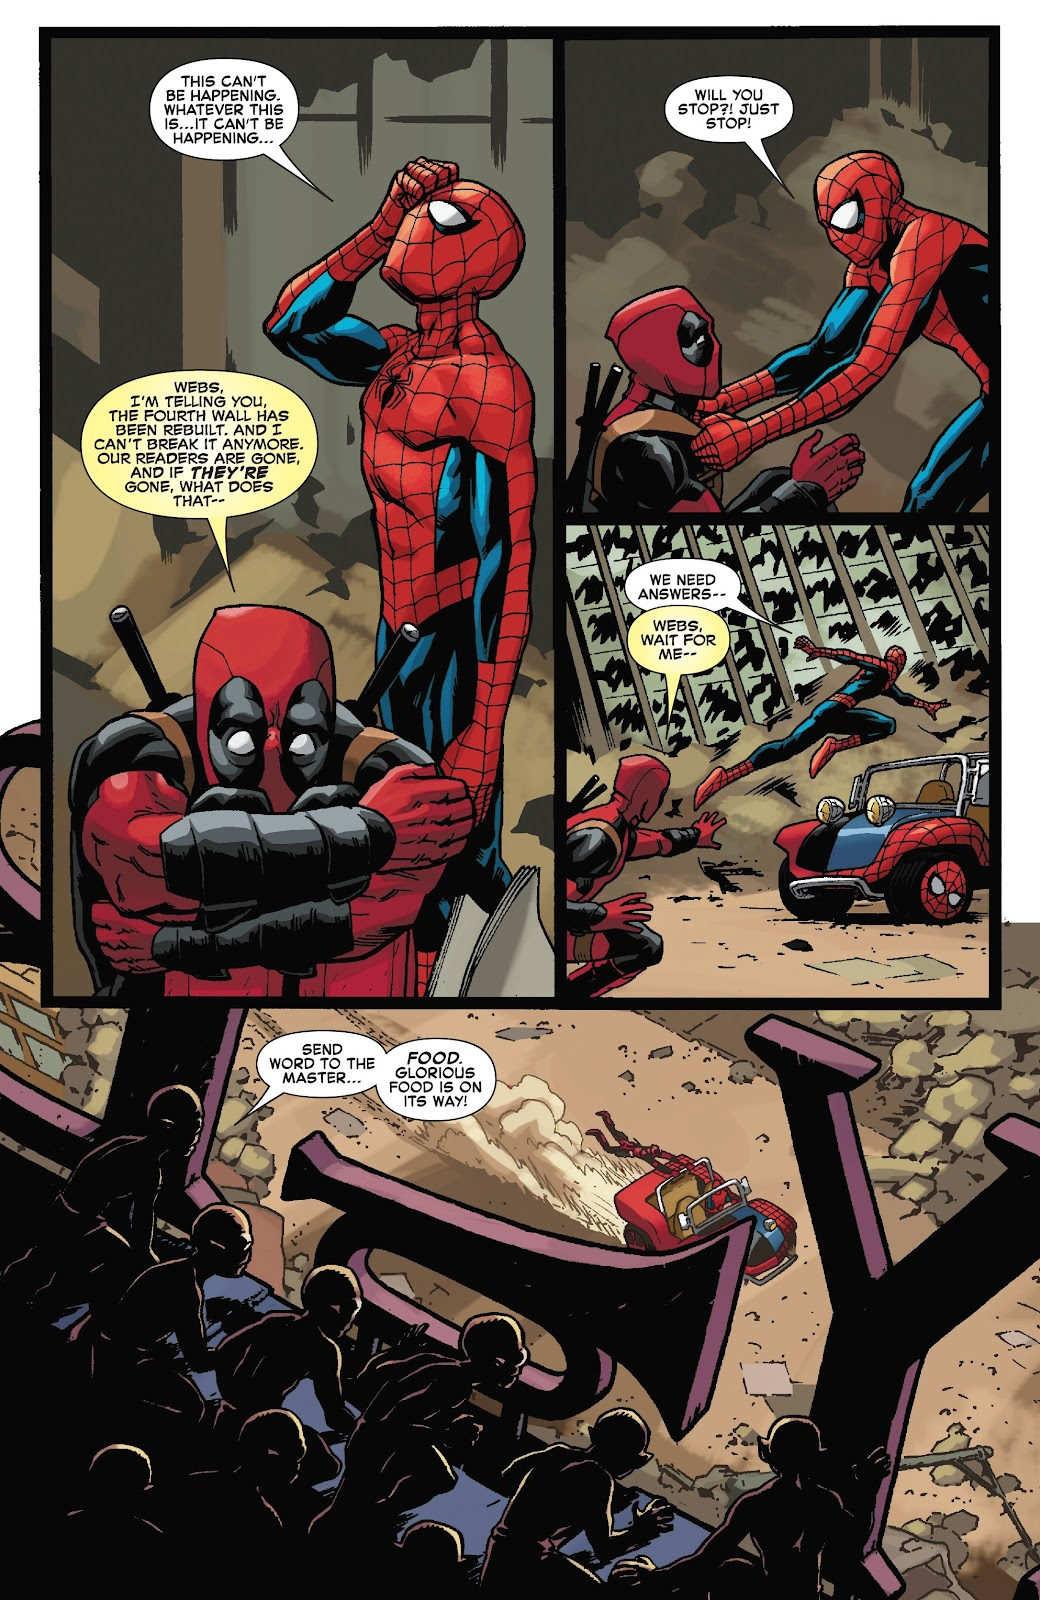 Read online Spider-Man/Deadpool comic -  Issue #46 - 9